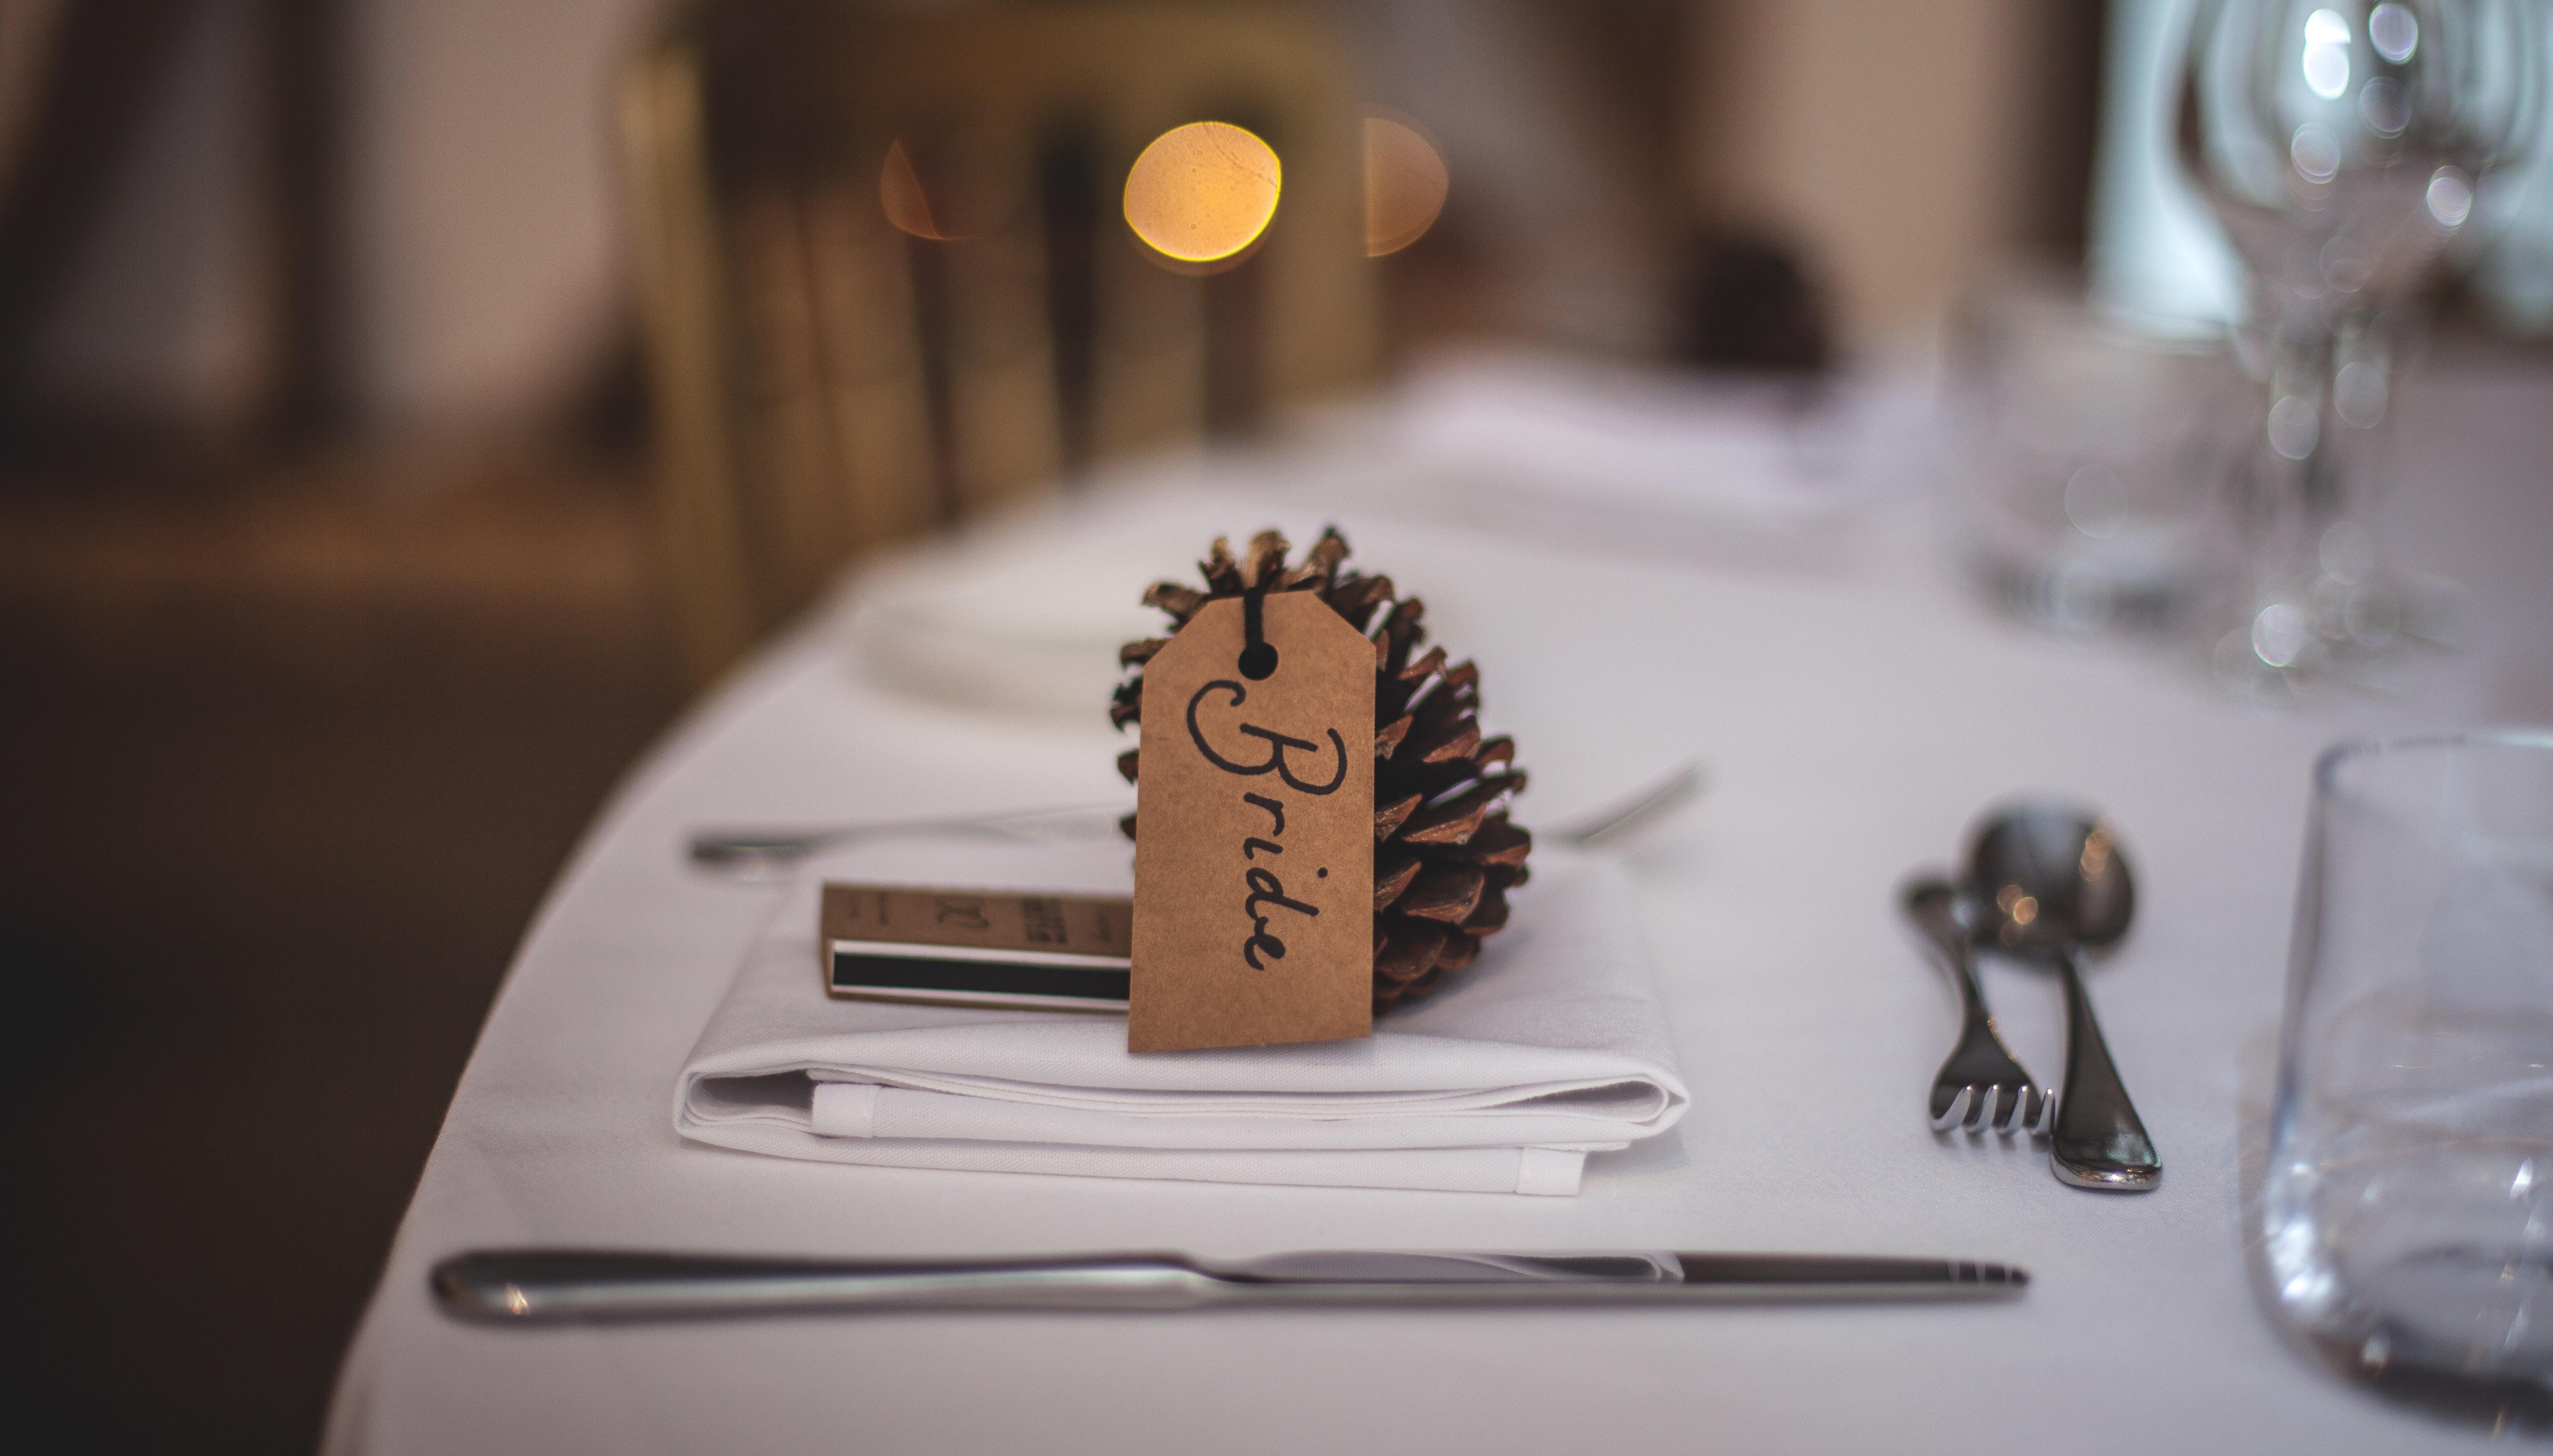 napkin near butter spreader on table